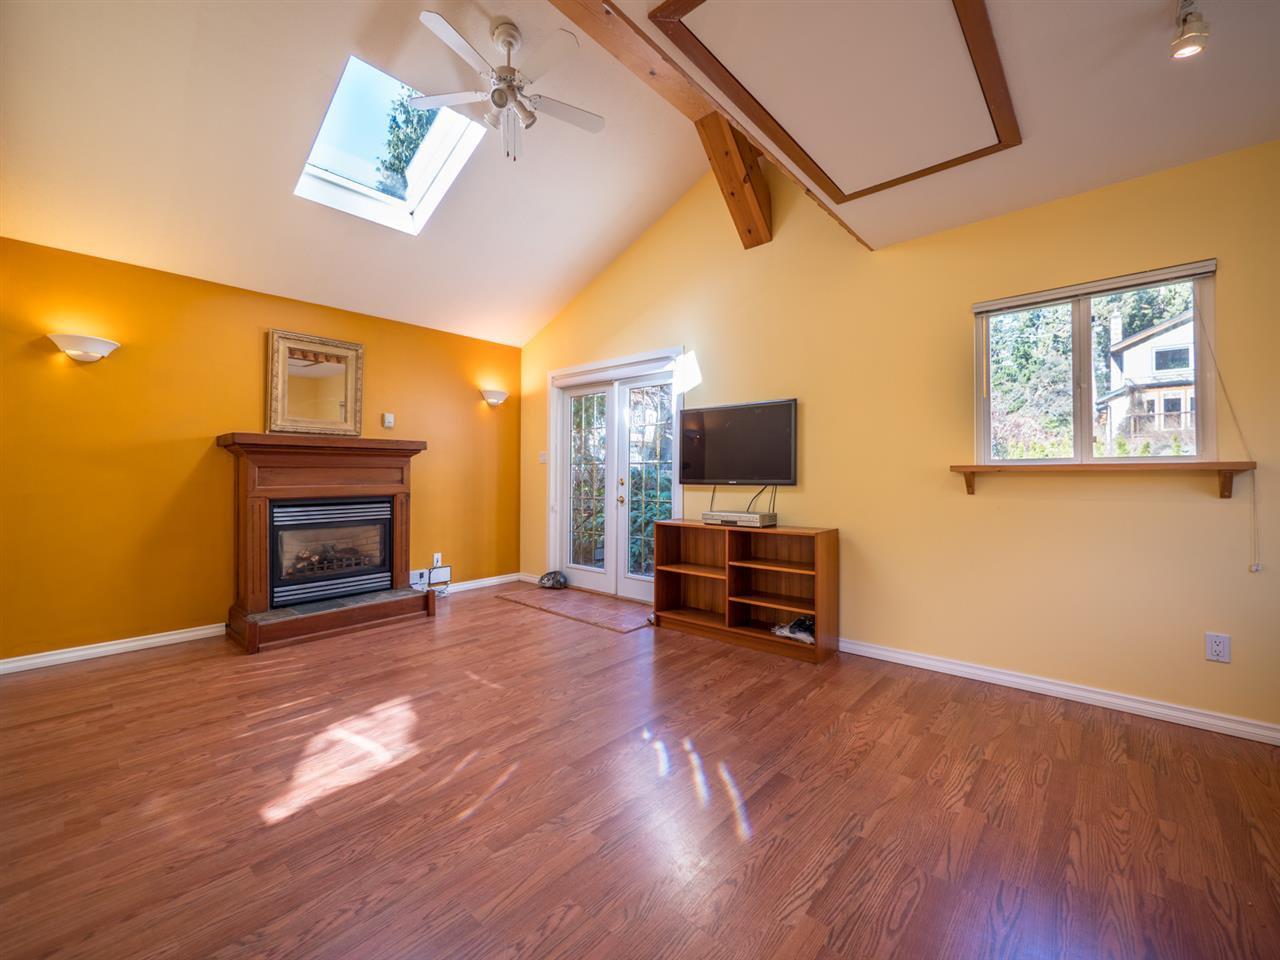 Photo 10: Photos: 3592 BEACH Avenue: Roberts Creek House for sale (Sunshine Coast)  : MLS®# R2244747